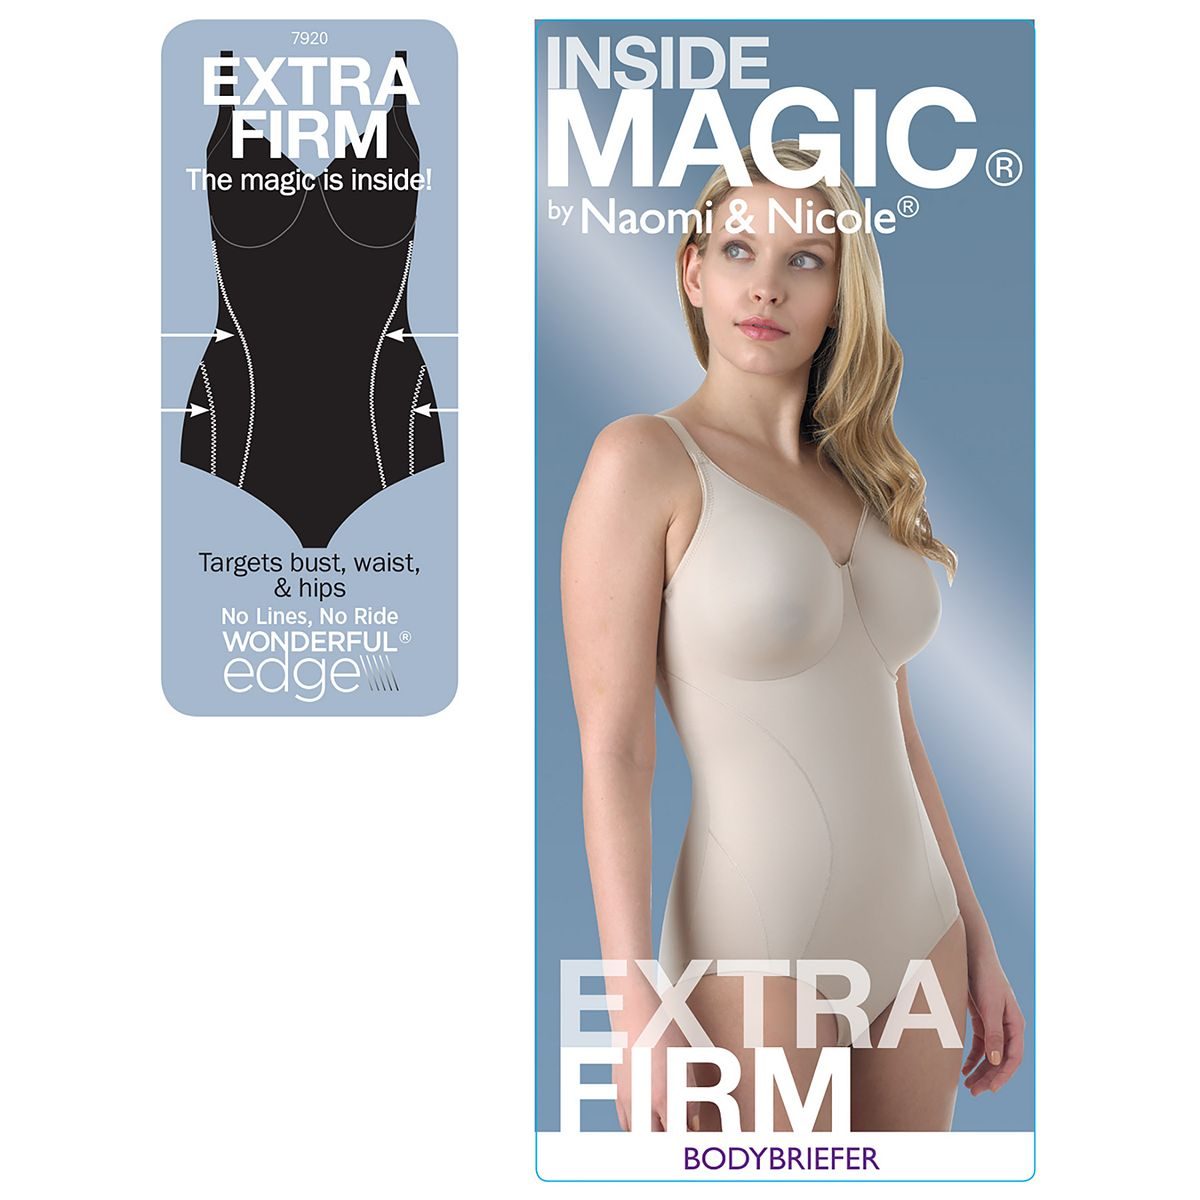 Naomi & Nicole Shapewear Inside Magic Body Shaper 7920 Black fjpKr